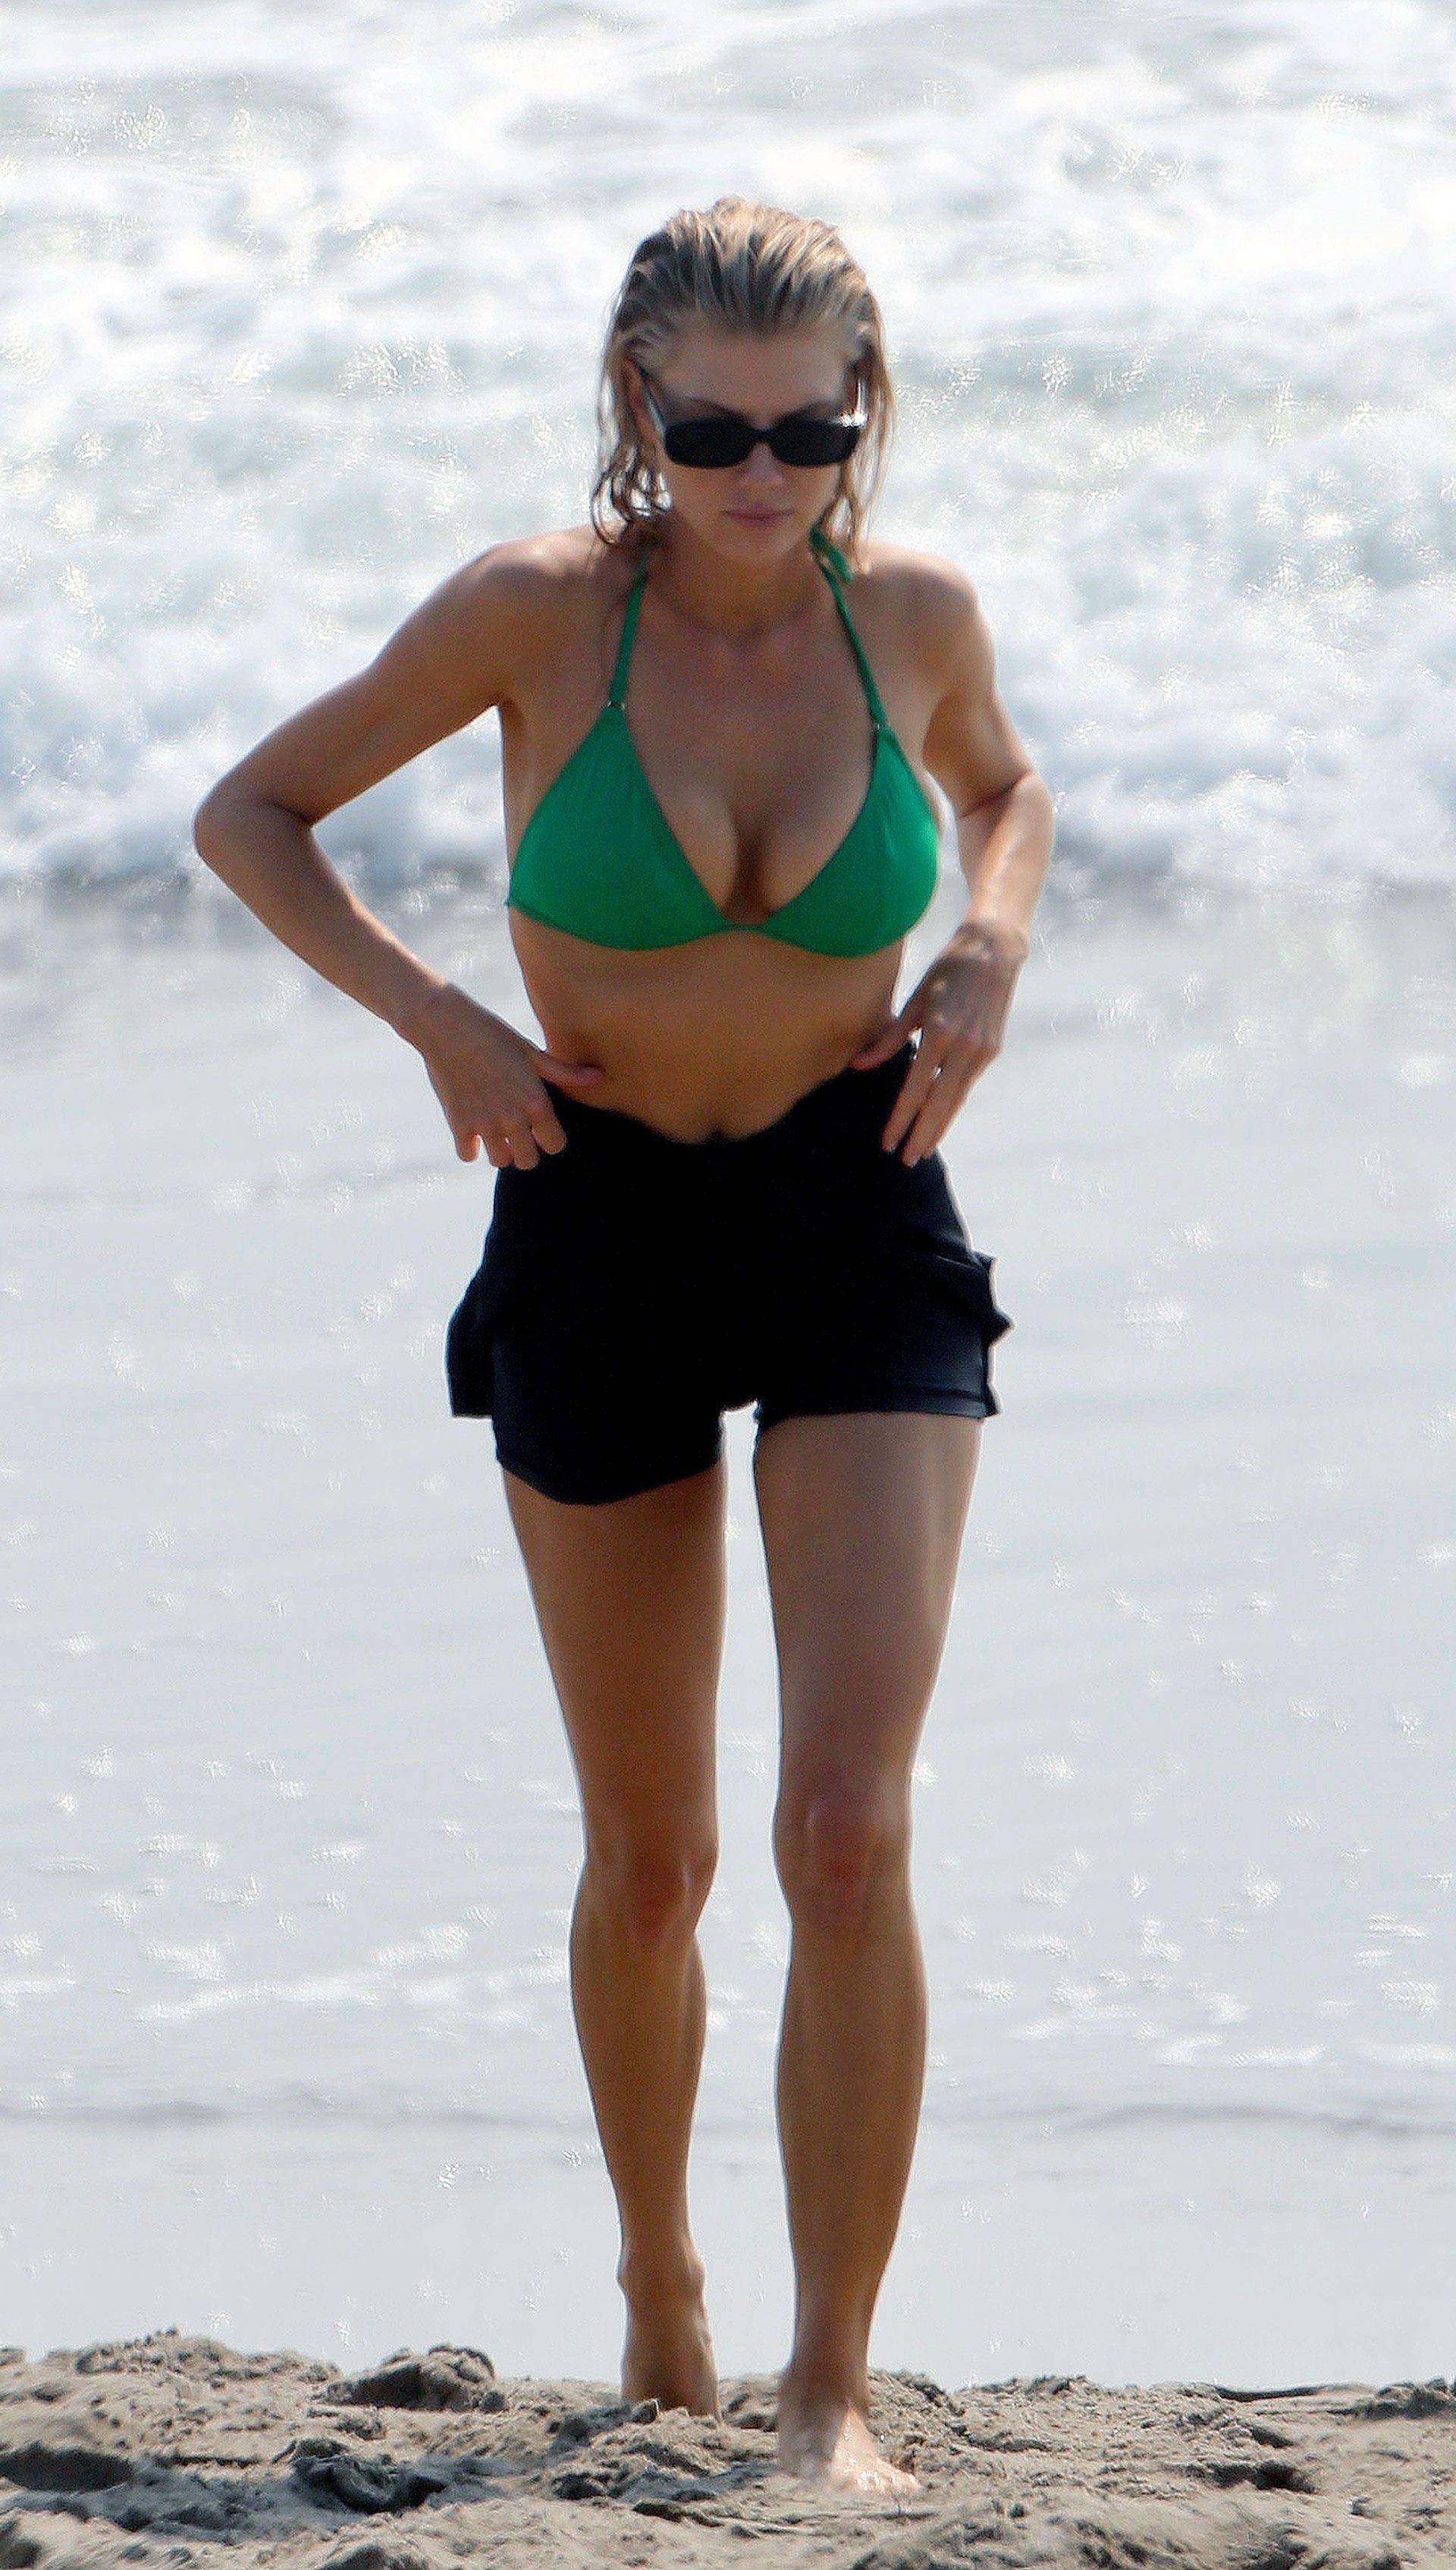 Celebrities-en-un-clic-Charlotte-McKinney-08102020